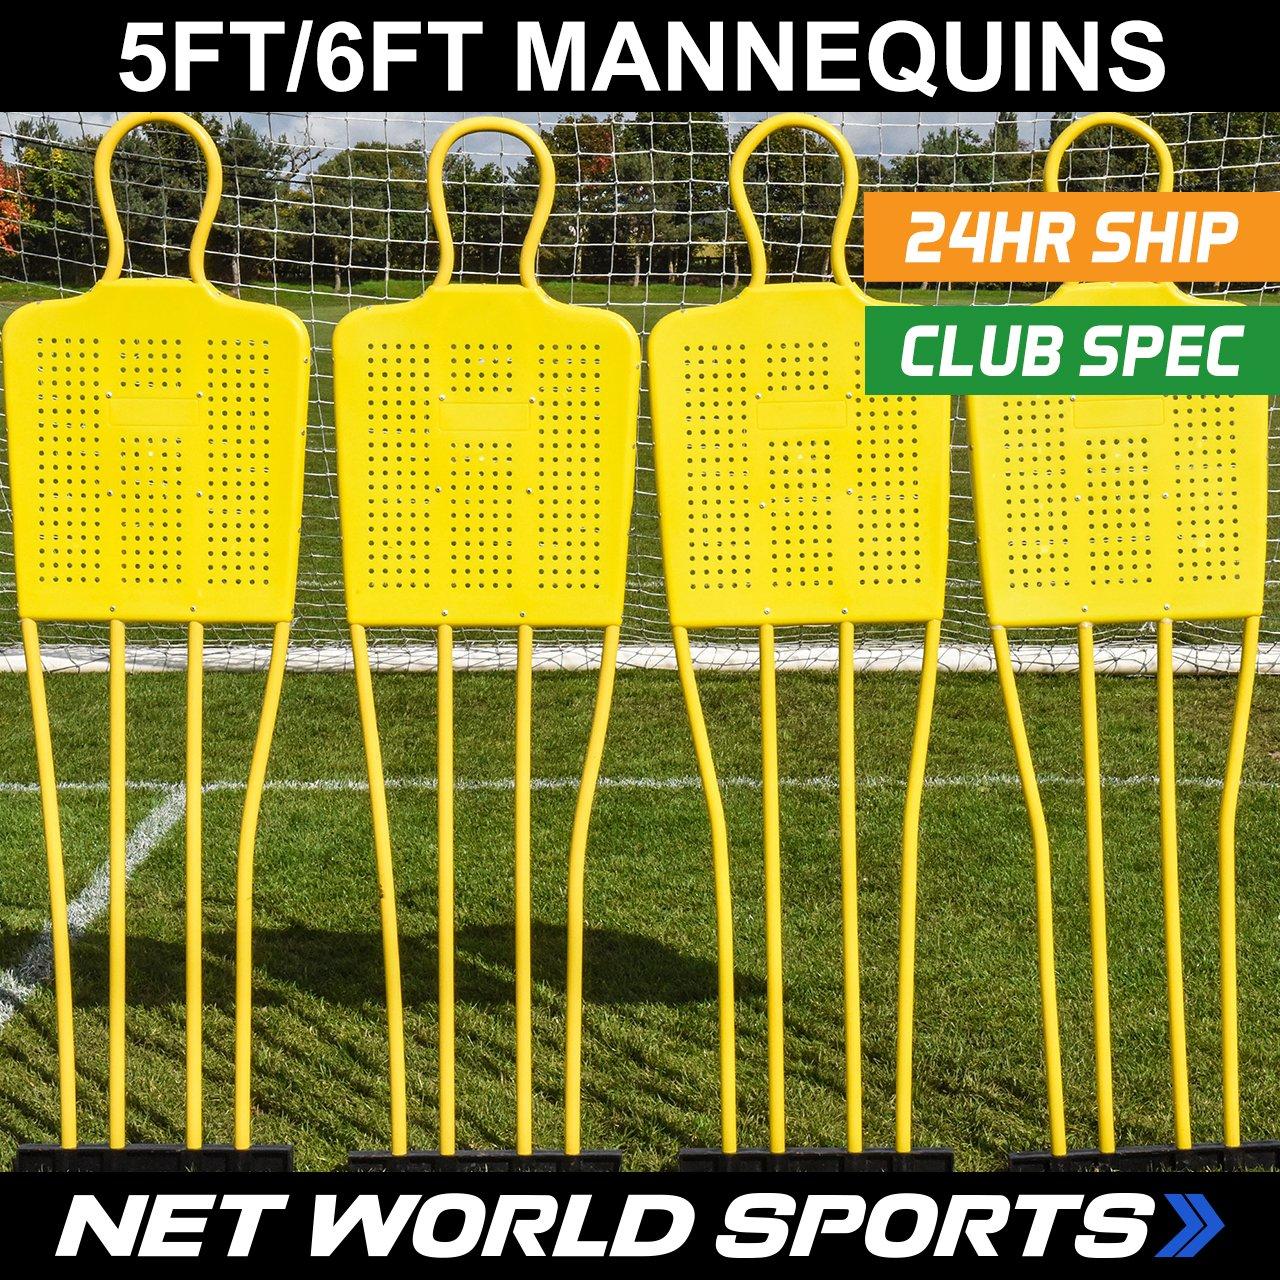 Forza Soccer Free Kick / Coaching Mannequin ( Junior / Seniorサイズ) (数量1または3 ) [ Net世界スポーツ] B00O58OWPW Single|Senior (6ft) Senior (6ft) Single